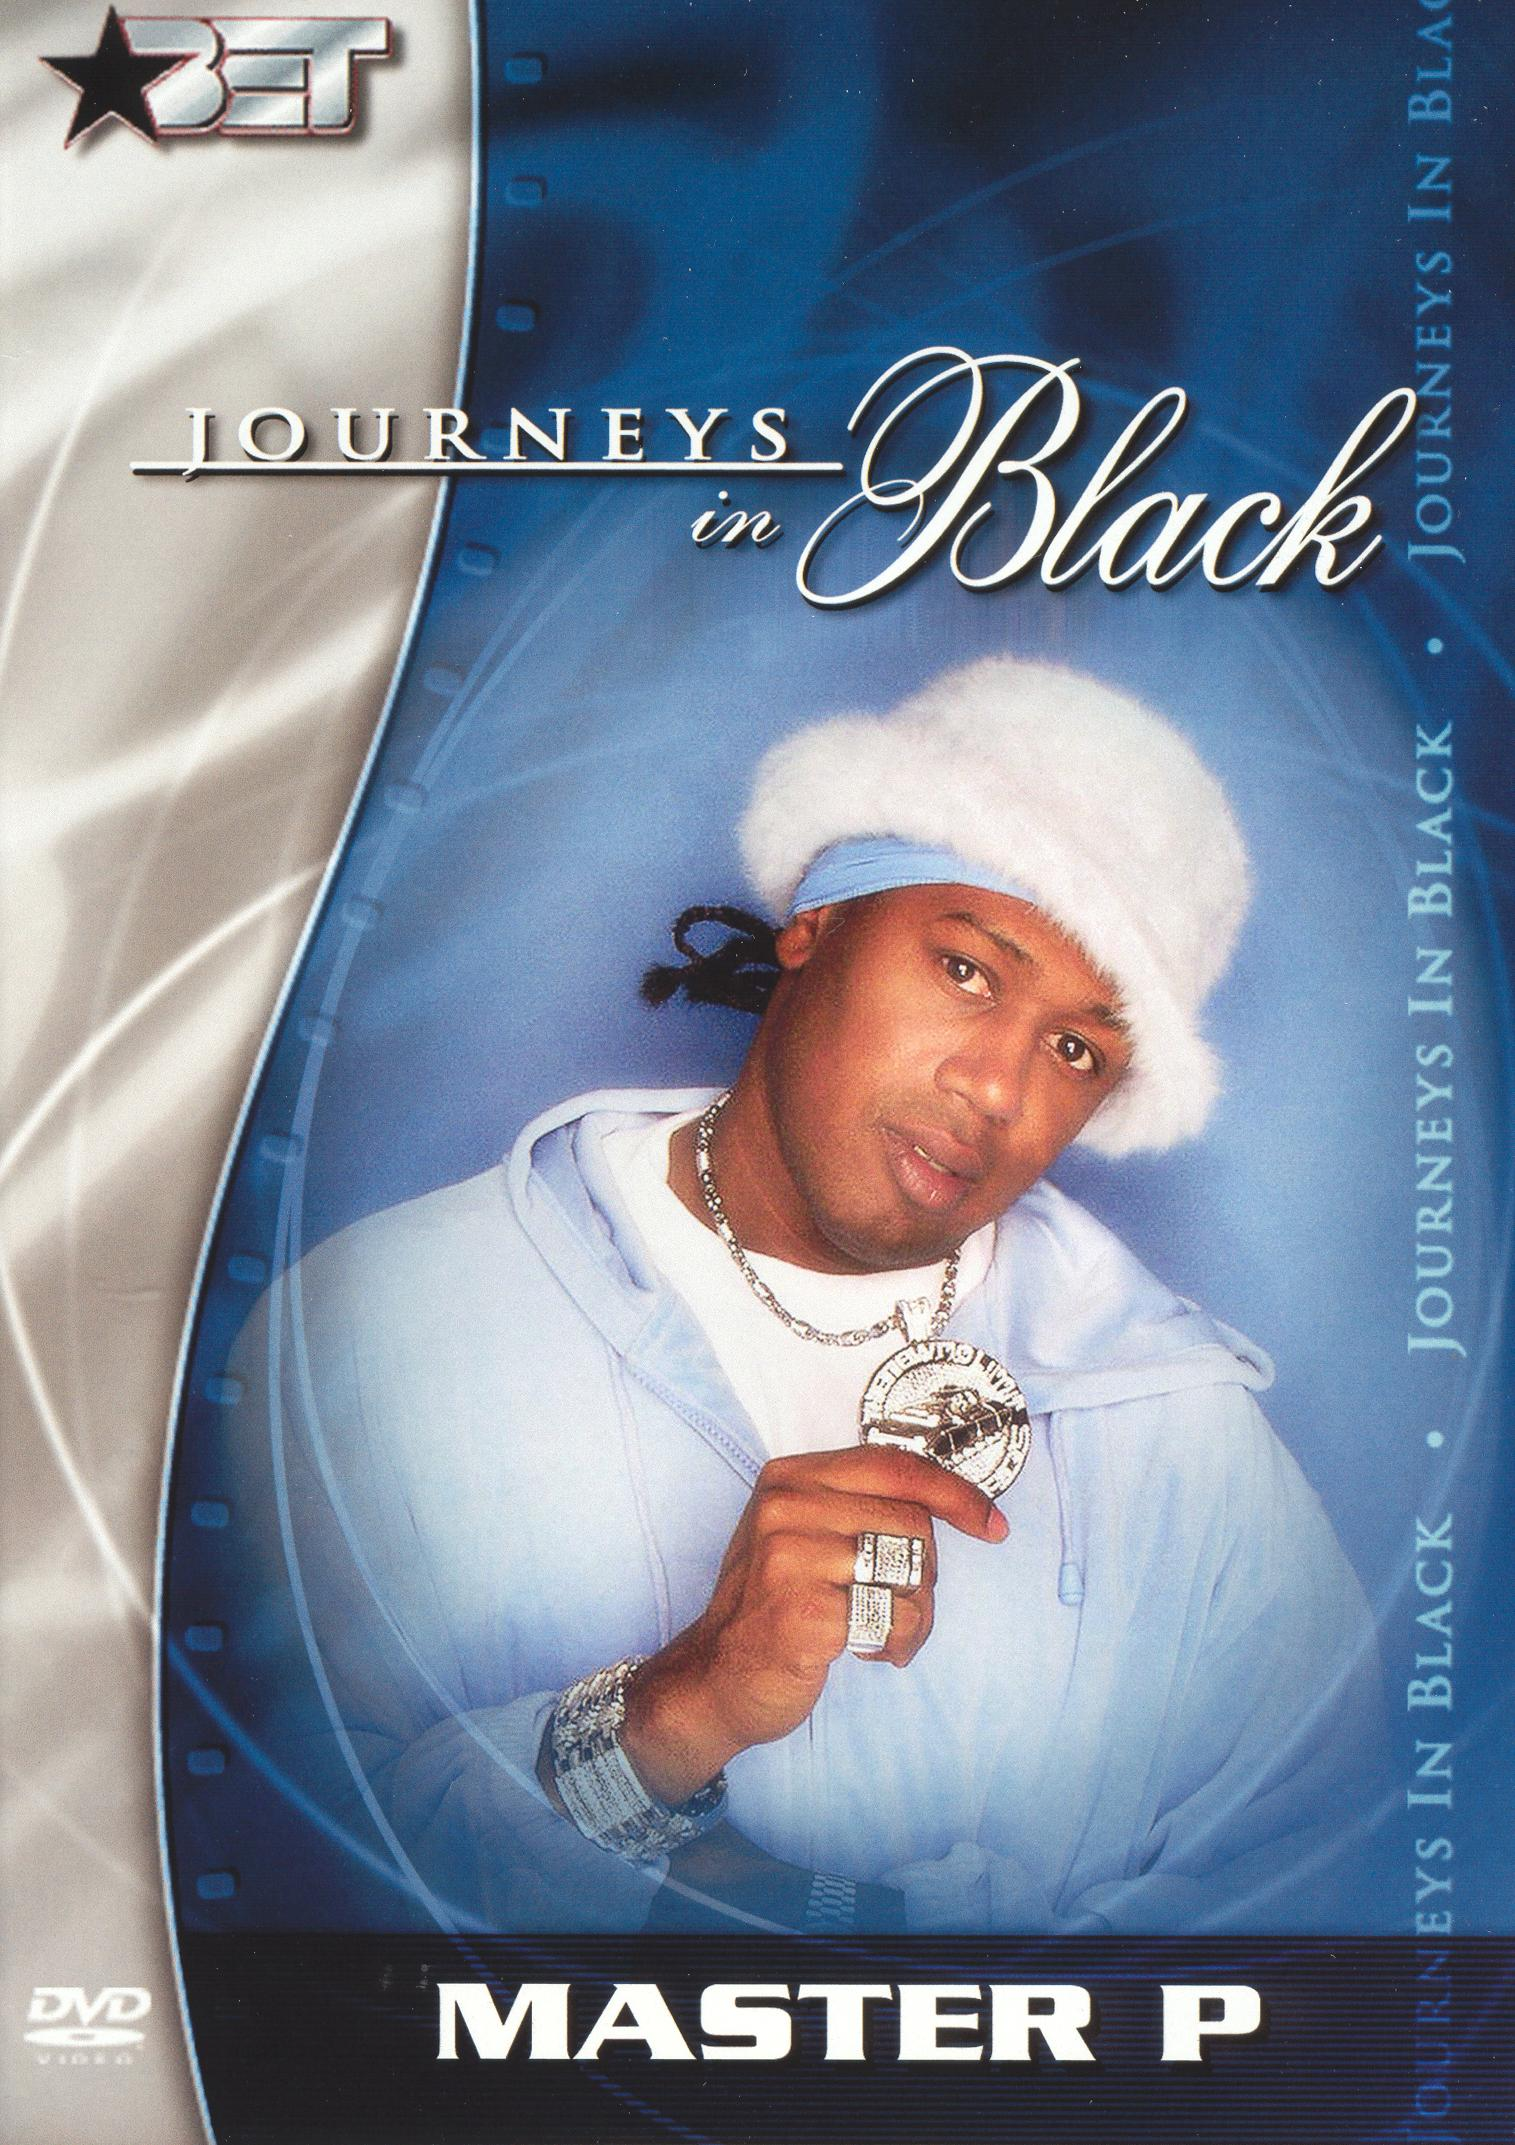 Journeys in Black: Master P